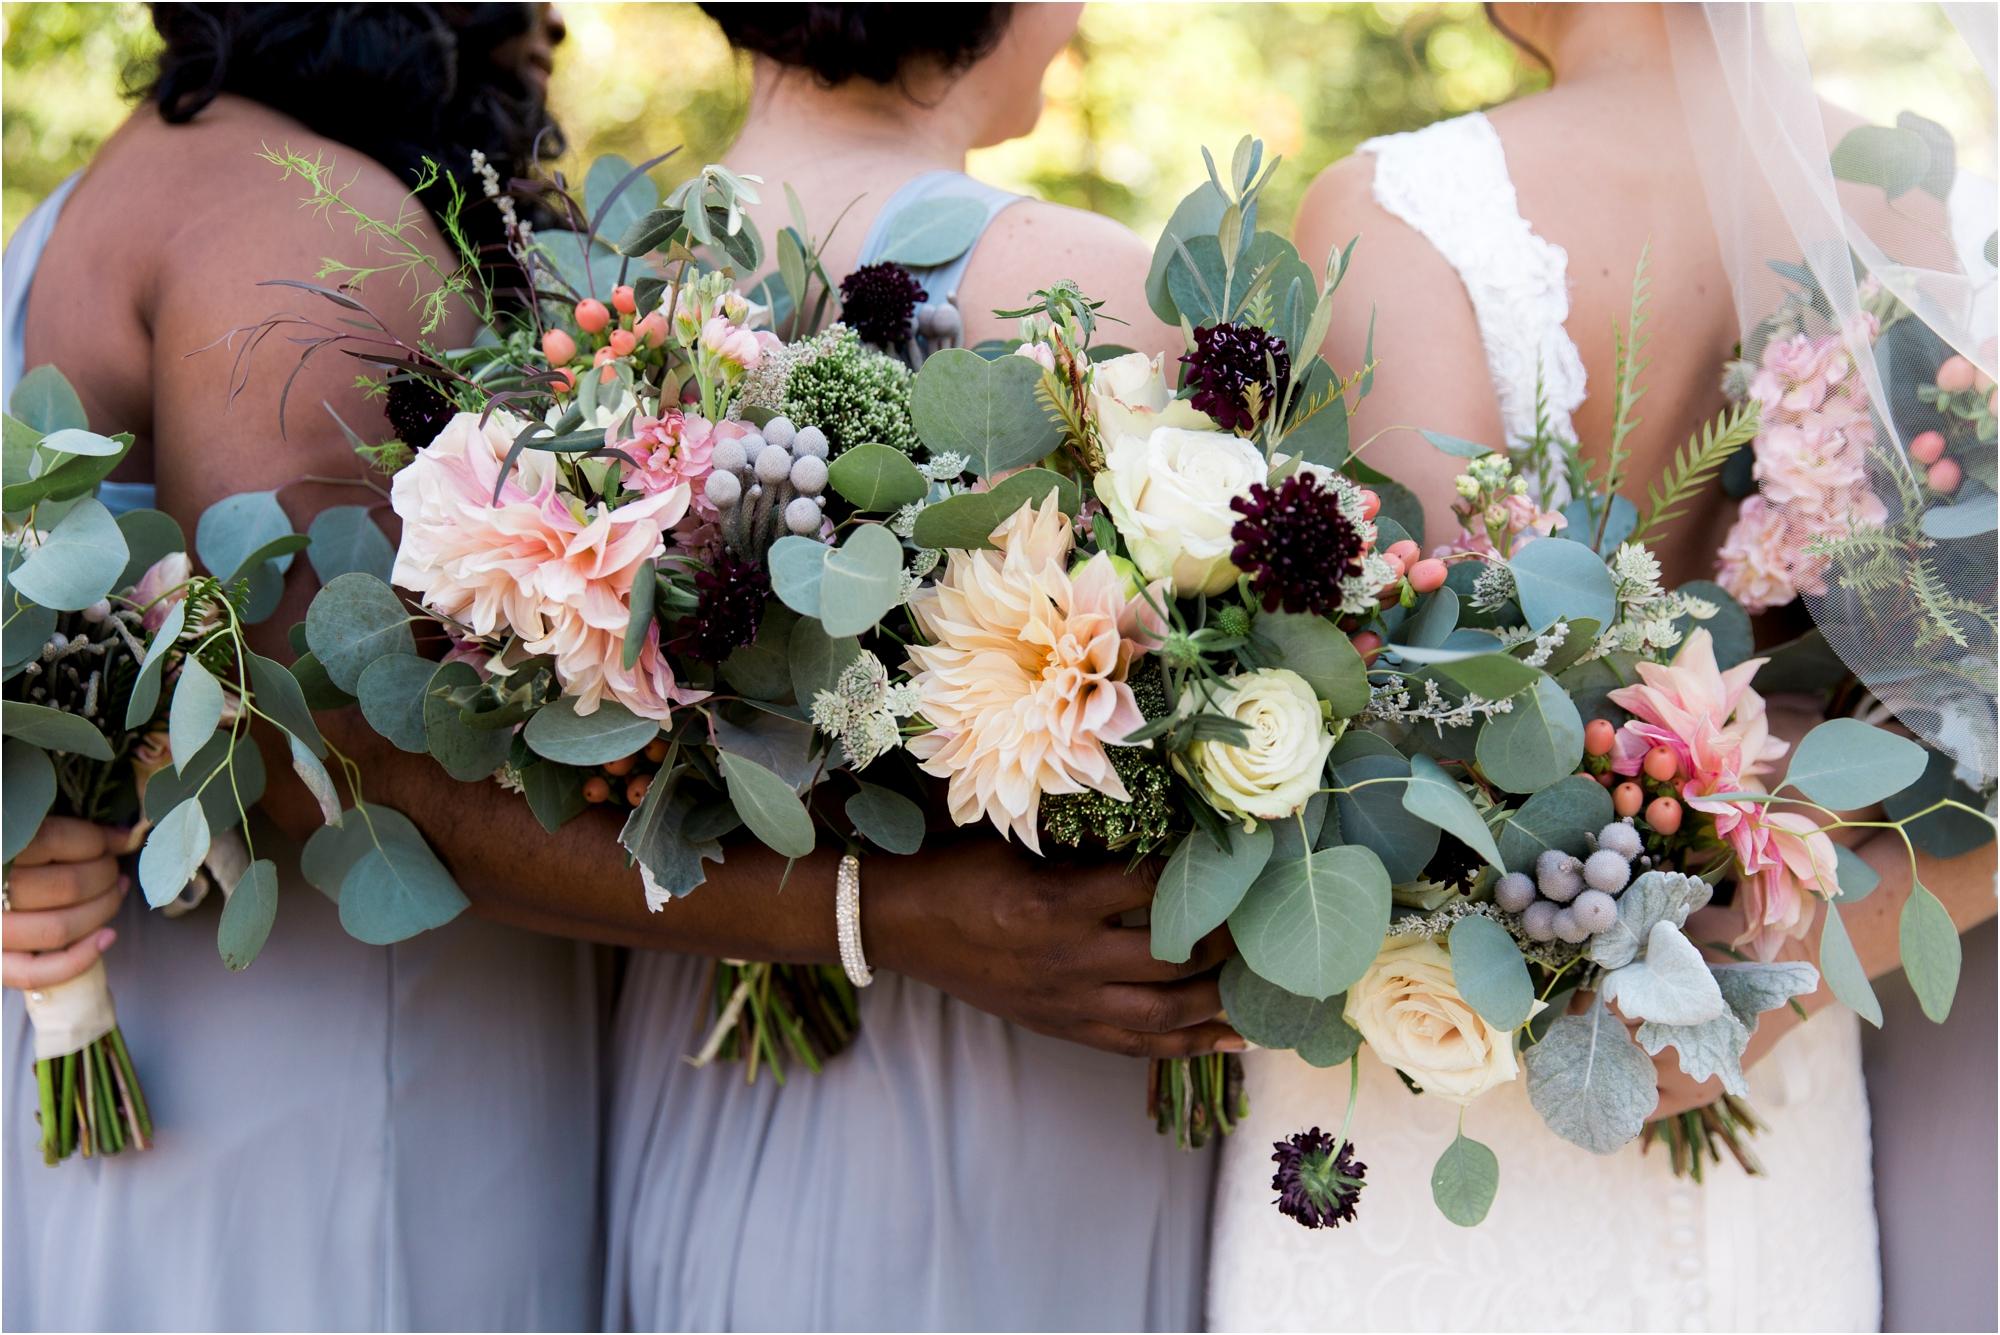 brittany-brad-ashton-creek-vineyard-richmond-virginia-wedding_0027.jpg